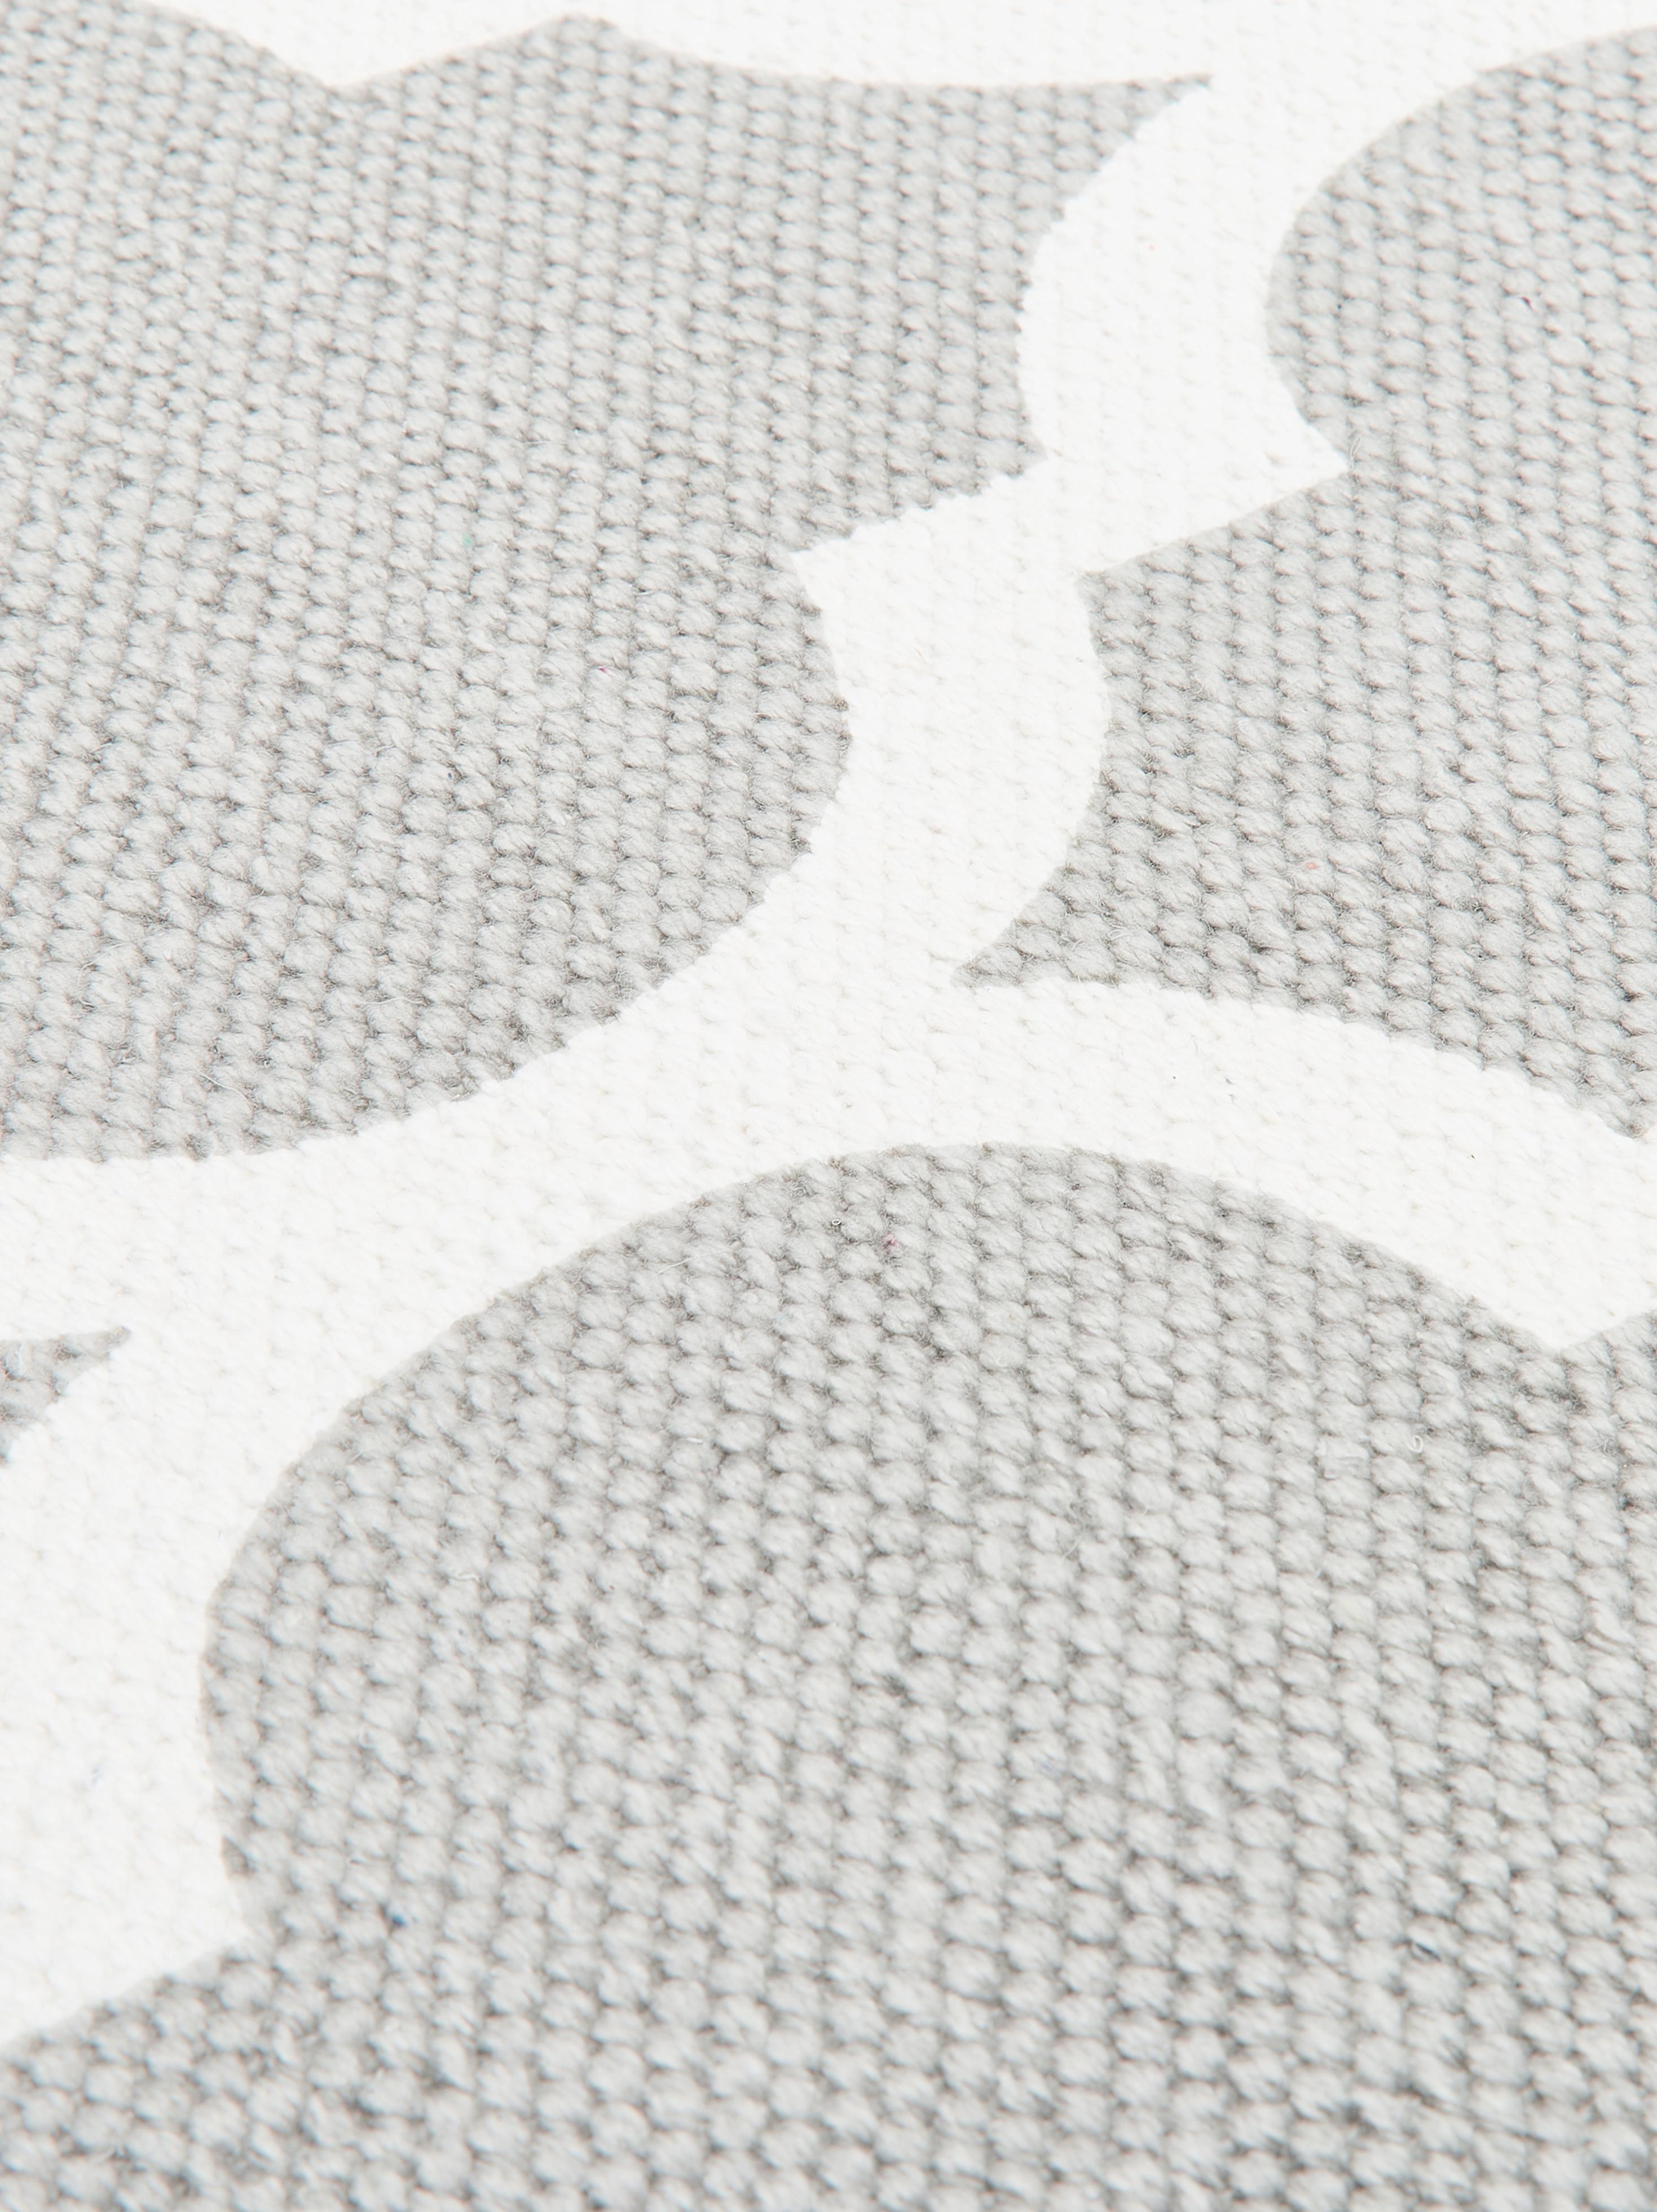 Flachgewebter Baumwollteppich Amira in Grau/Weiss, 100% Baumwolle, Hellgrau, Cremeweiss, B 70 x L 140 cm (Grösse XS)